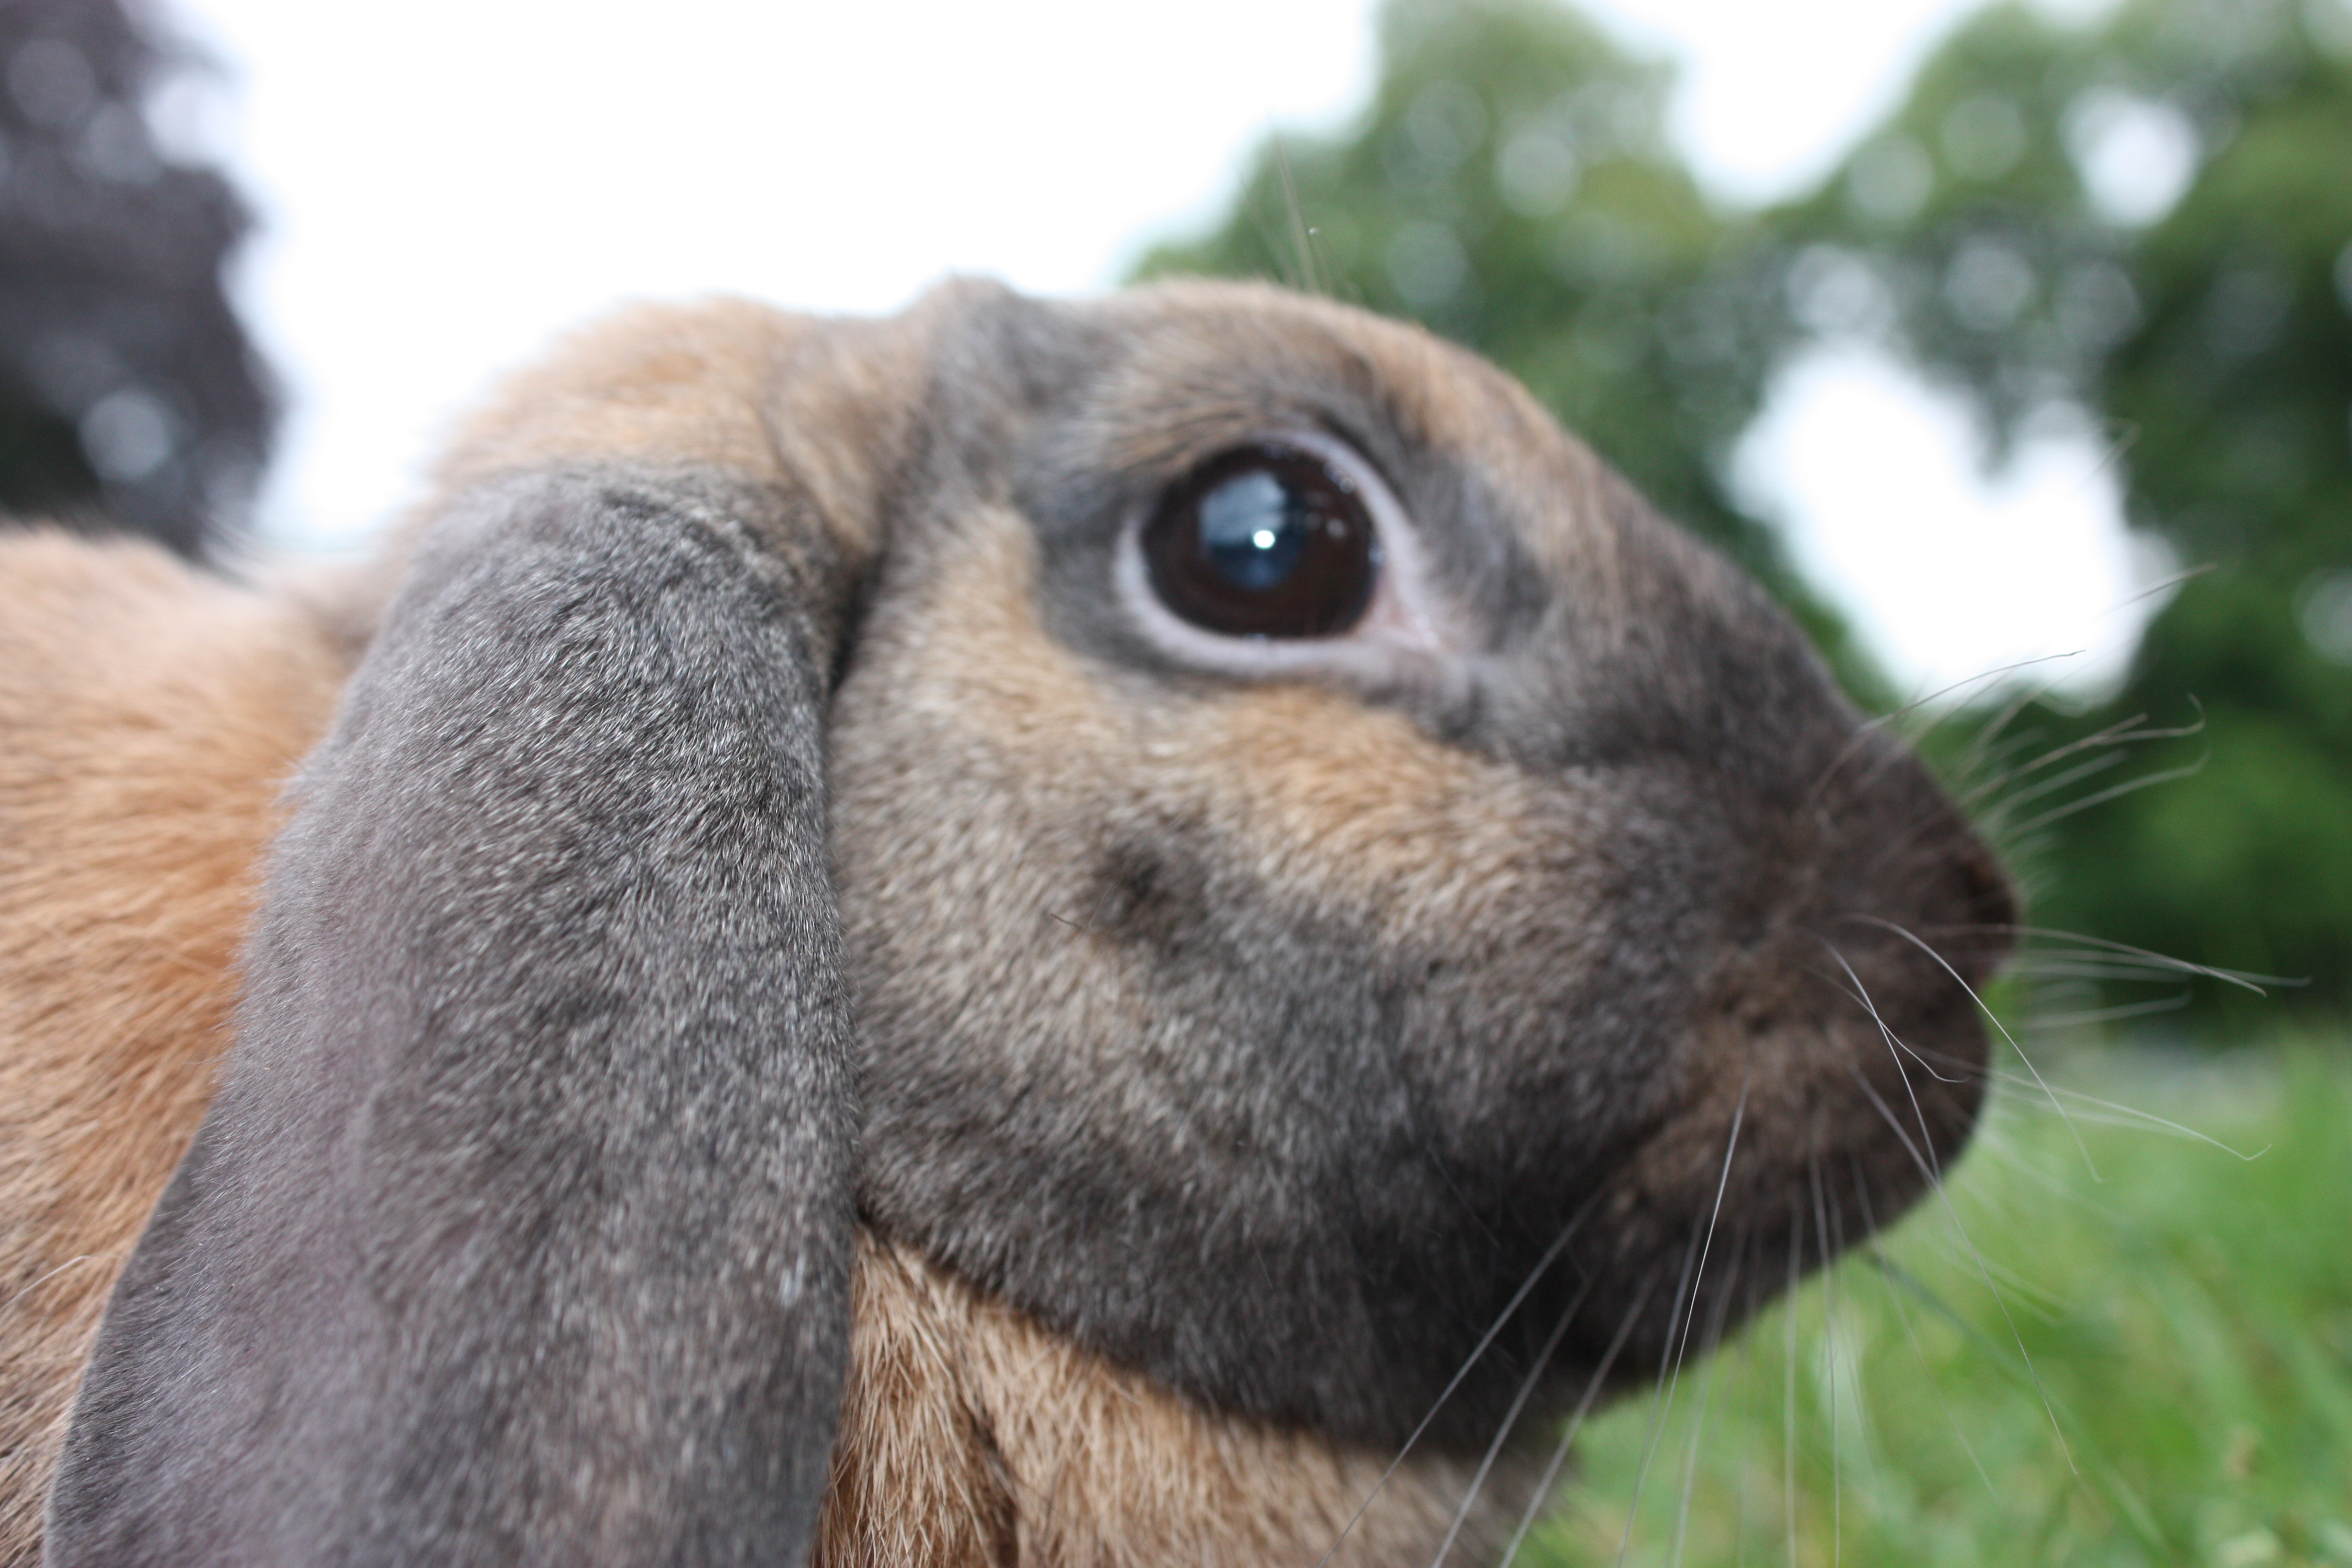 Lapin b lier nain parc ext rieur gros plan flickr for Parc a lapin exterieur